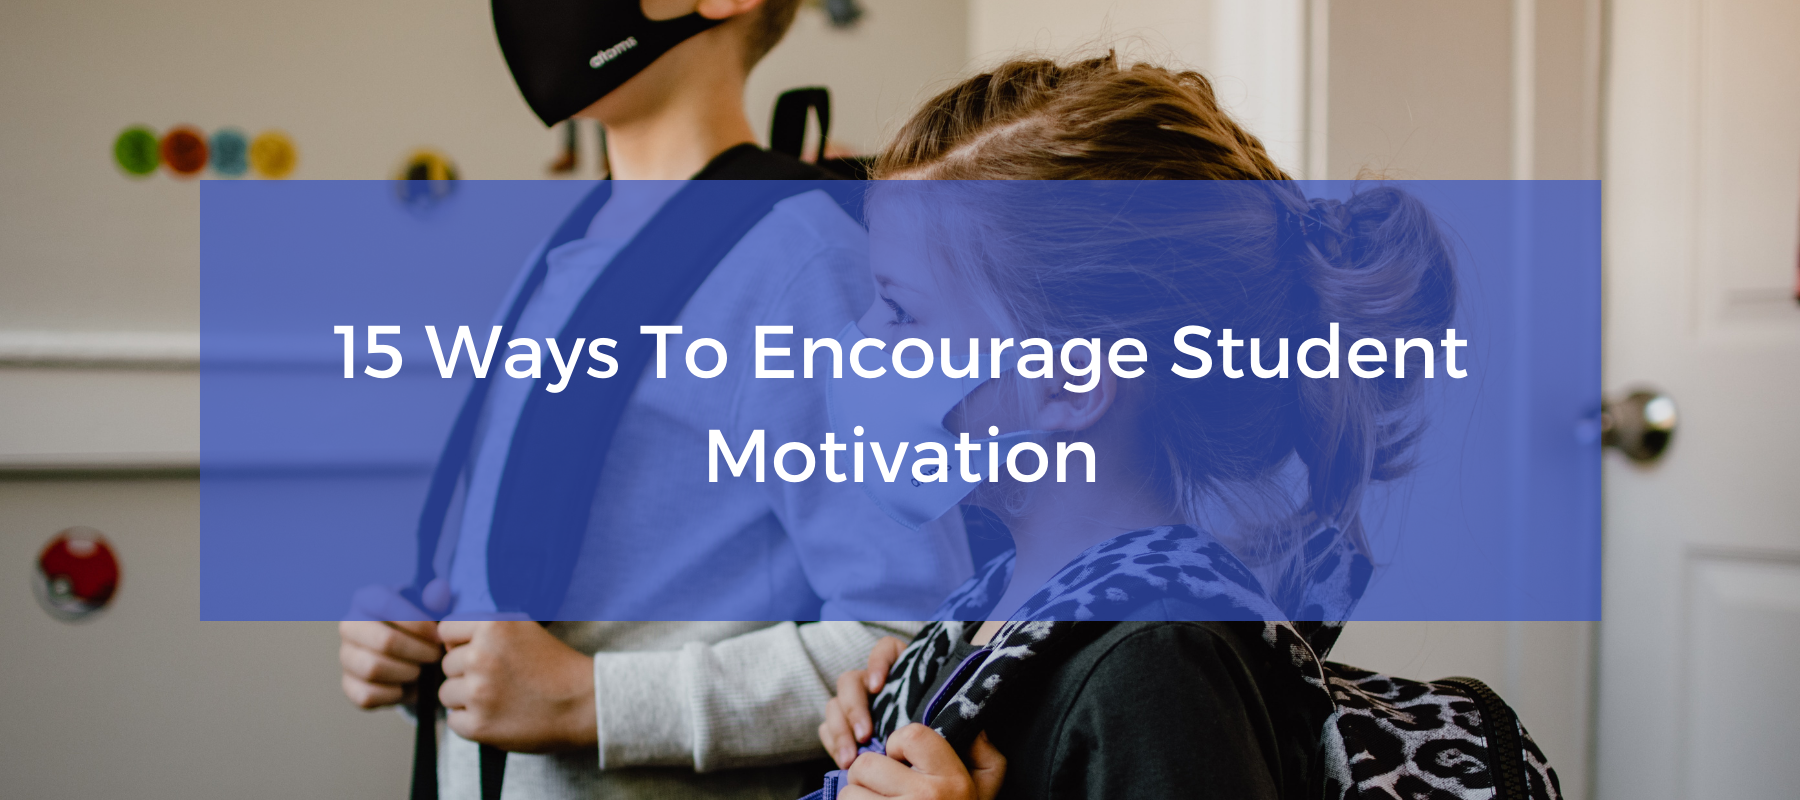 15 ways to encourage student motivation